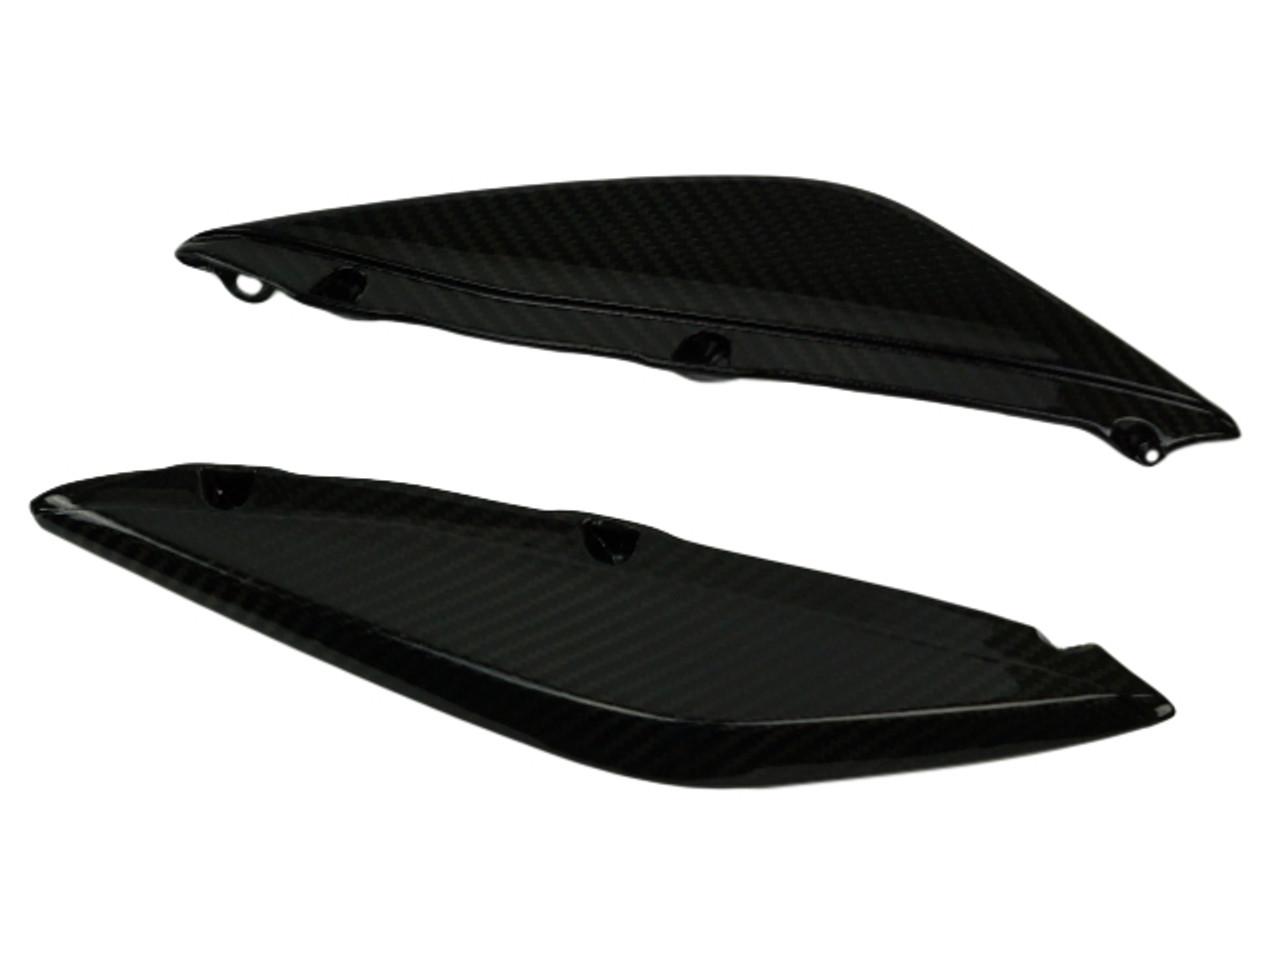 Side Fairings (C) in Glossy Twill weave Carbon Fiber for MV Agusta Rivale 800